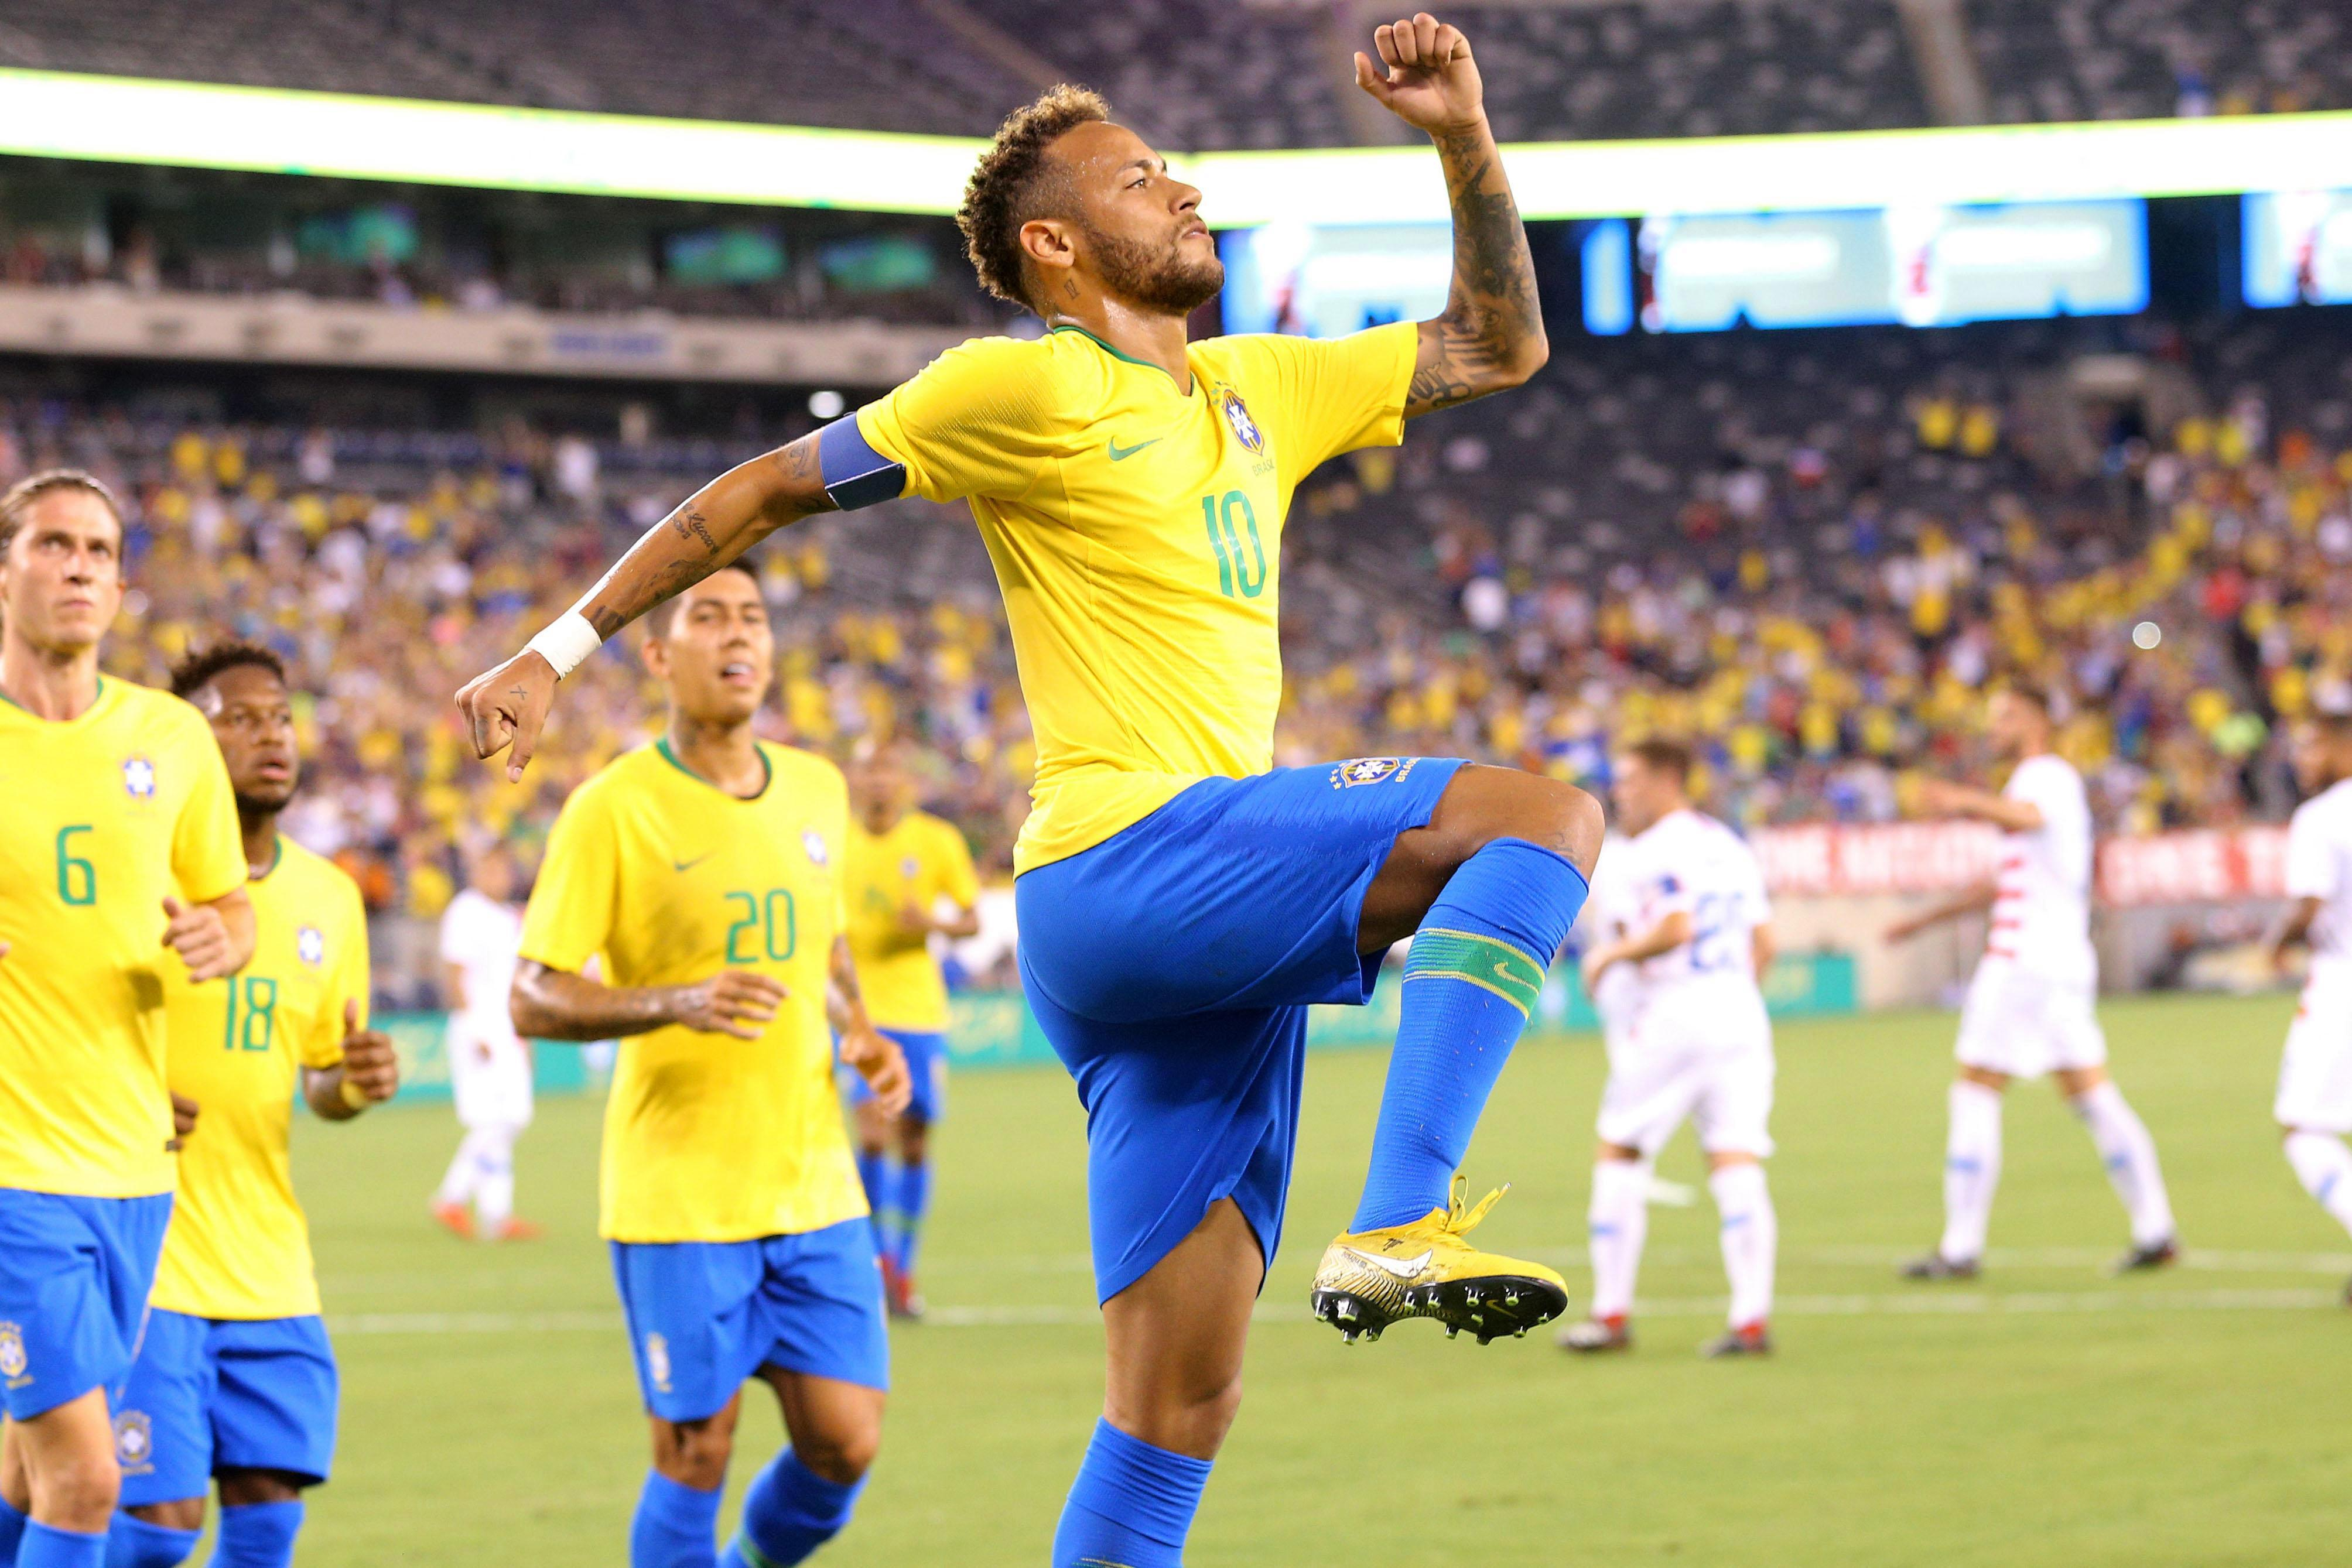 Neymar scored from the spot